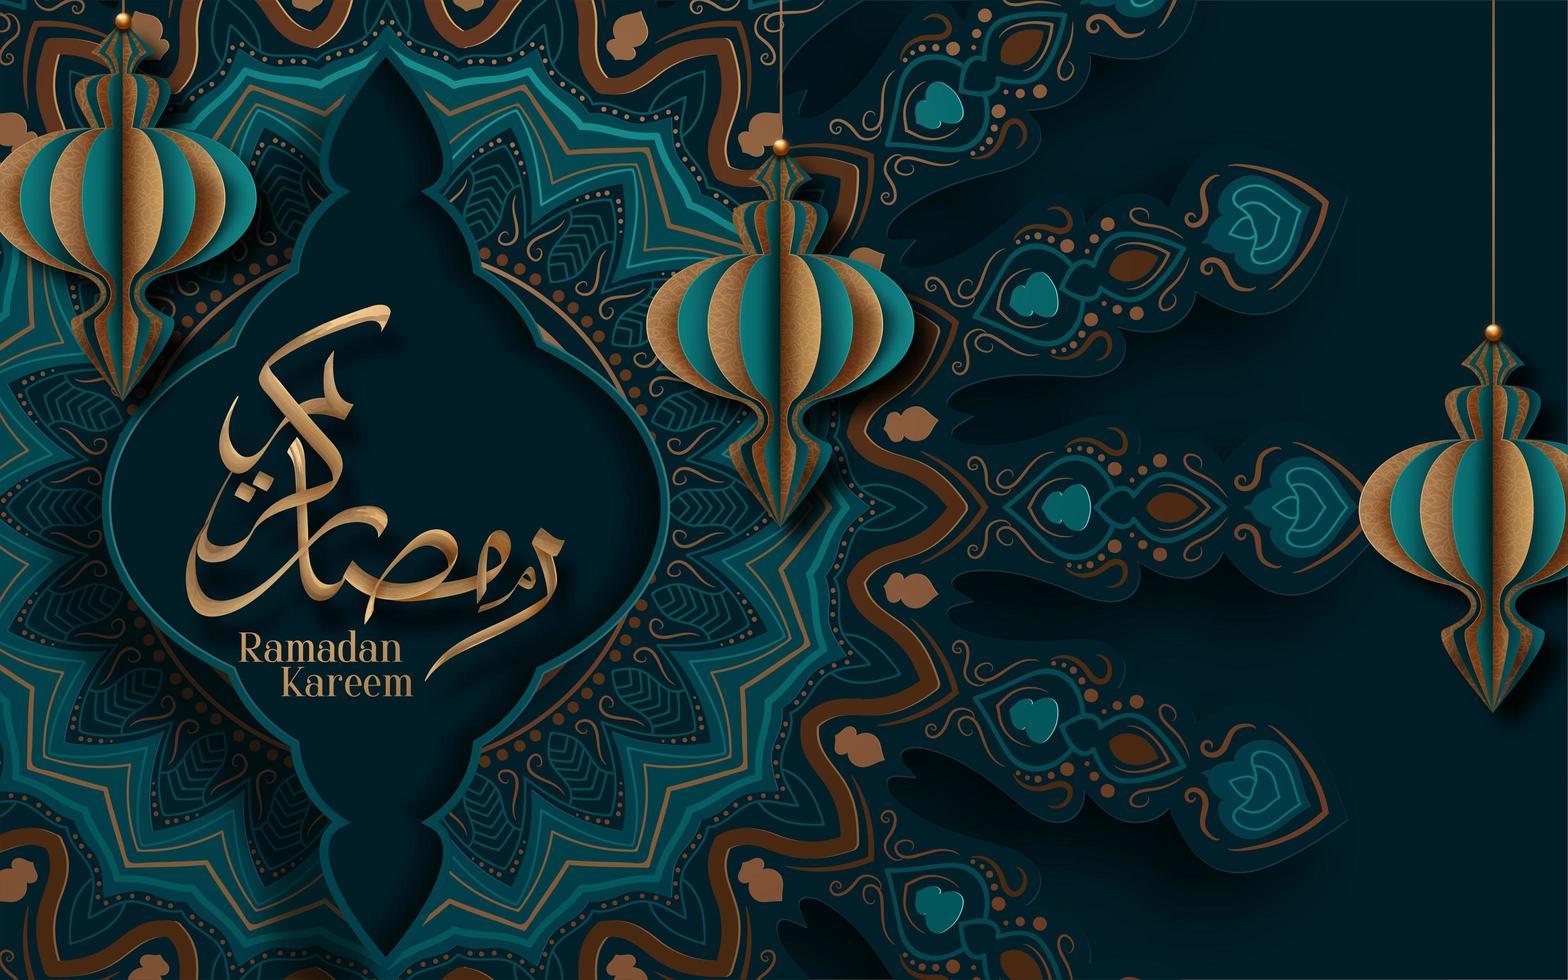 Saludo de Ramadan Kareem adornado con linternas de papel colgantes 3d vector